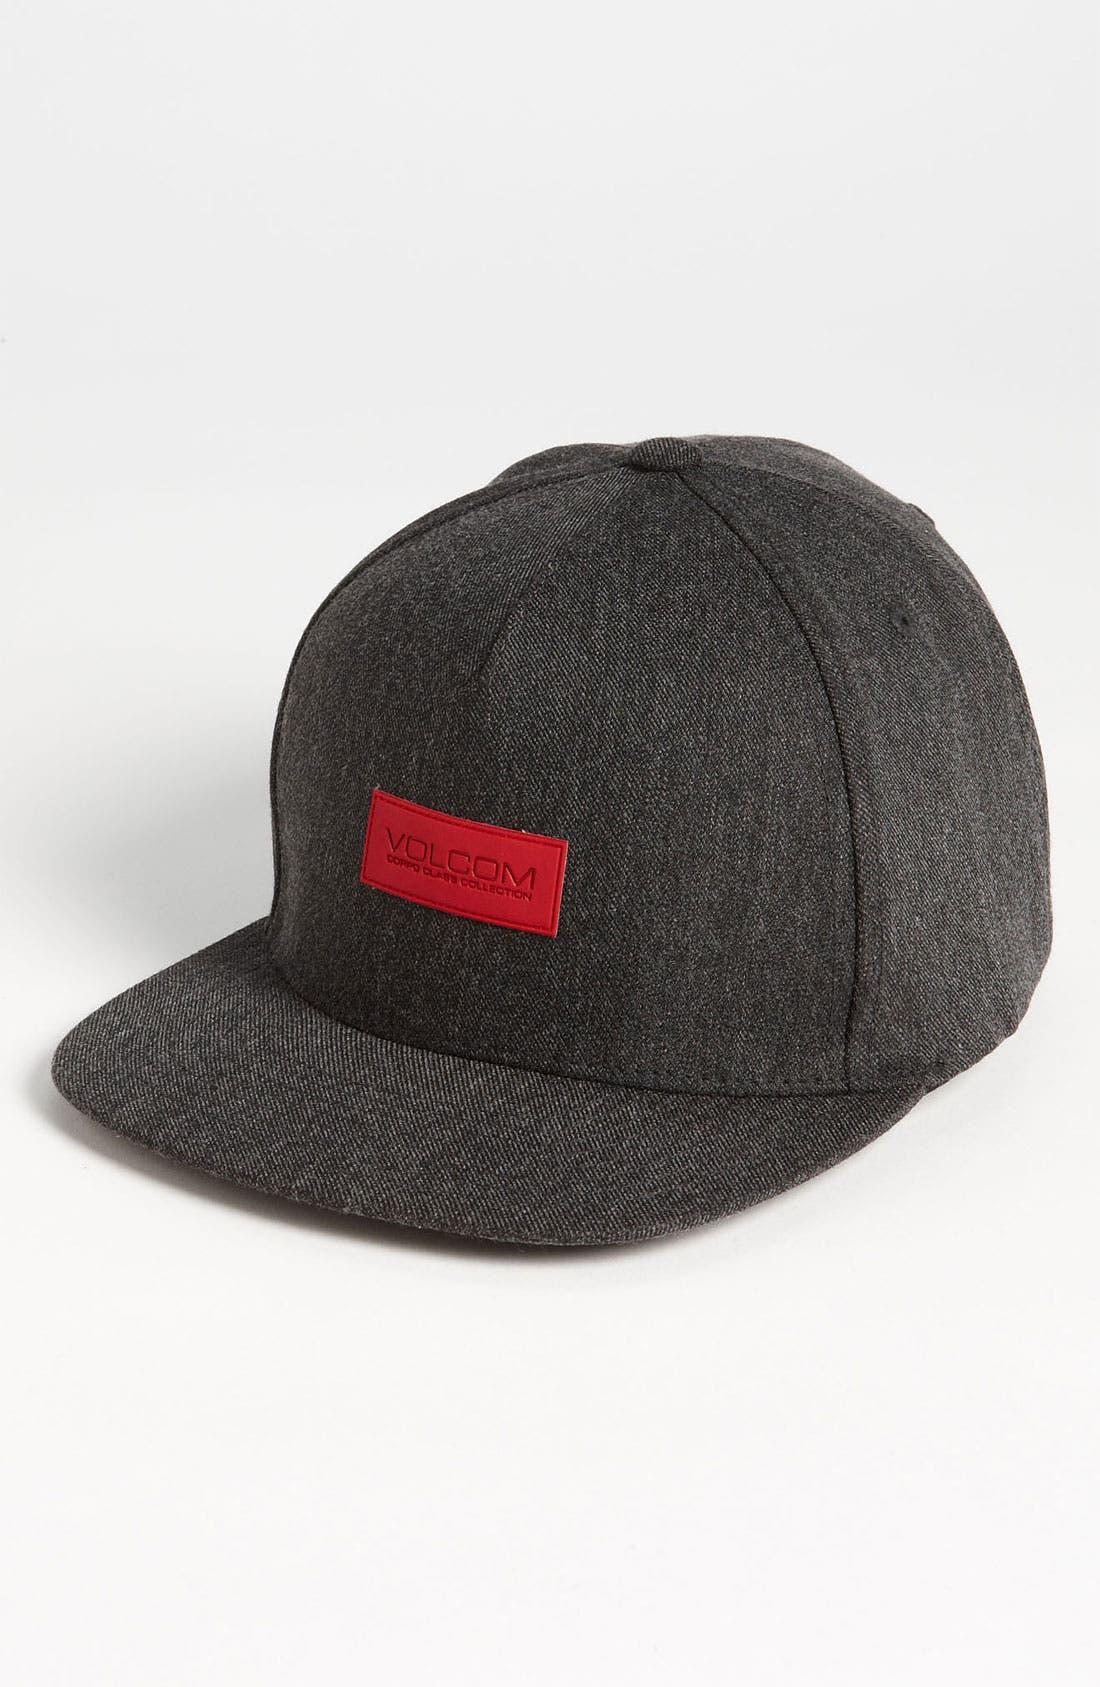 Alternate Image 1 Selected - Volcom 'Exec' Snapback Hat (Big Boys)